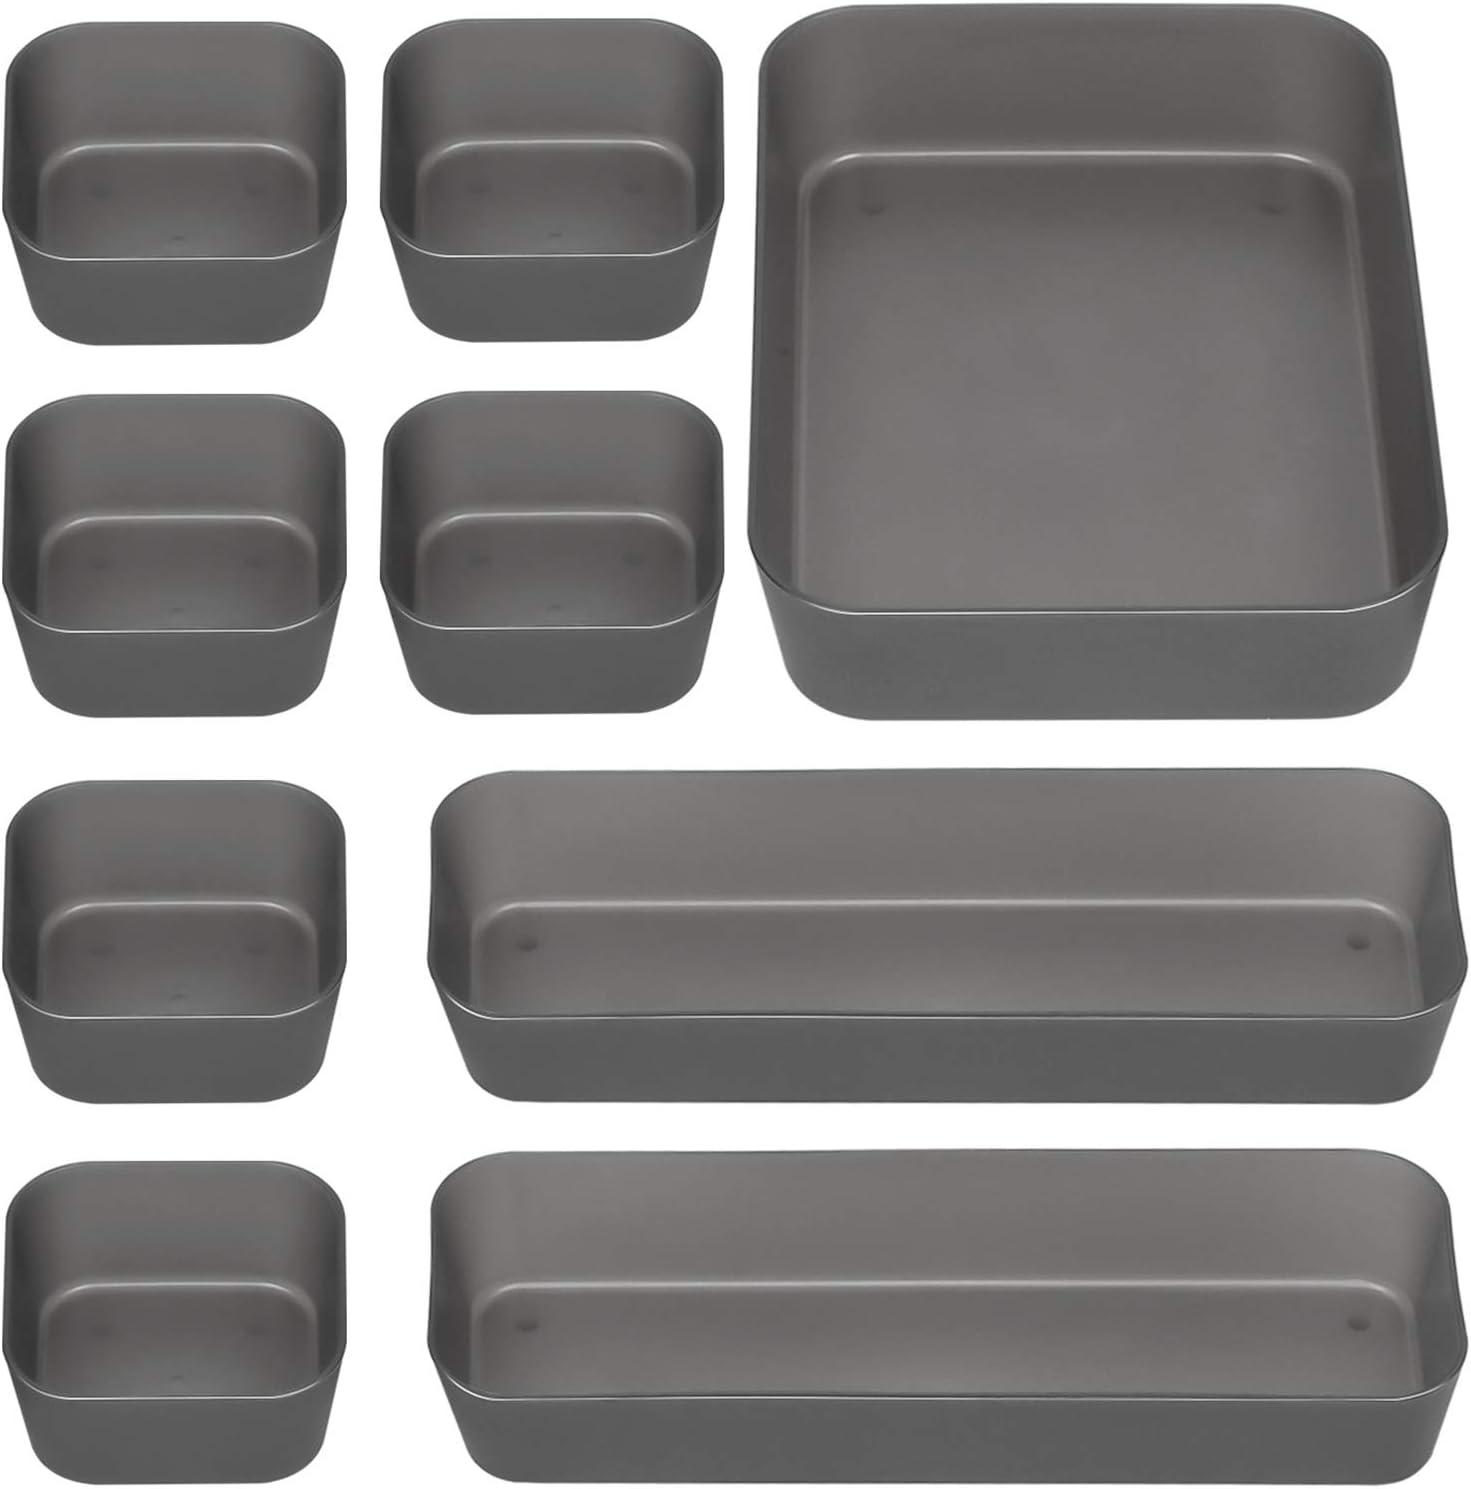 JARLINK 9 Pack Desk Drawer Organizer Trays with 3 Different Sizes, Versatile Drawer Organizers Storage for Bathroom, Makeup, Bedroom Dresser, Kitchen, Office, Craft (Black)